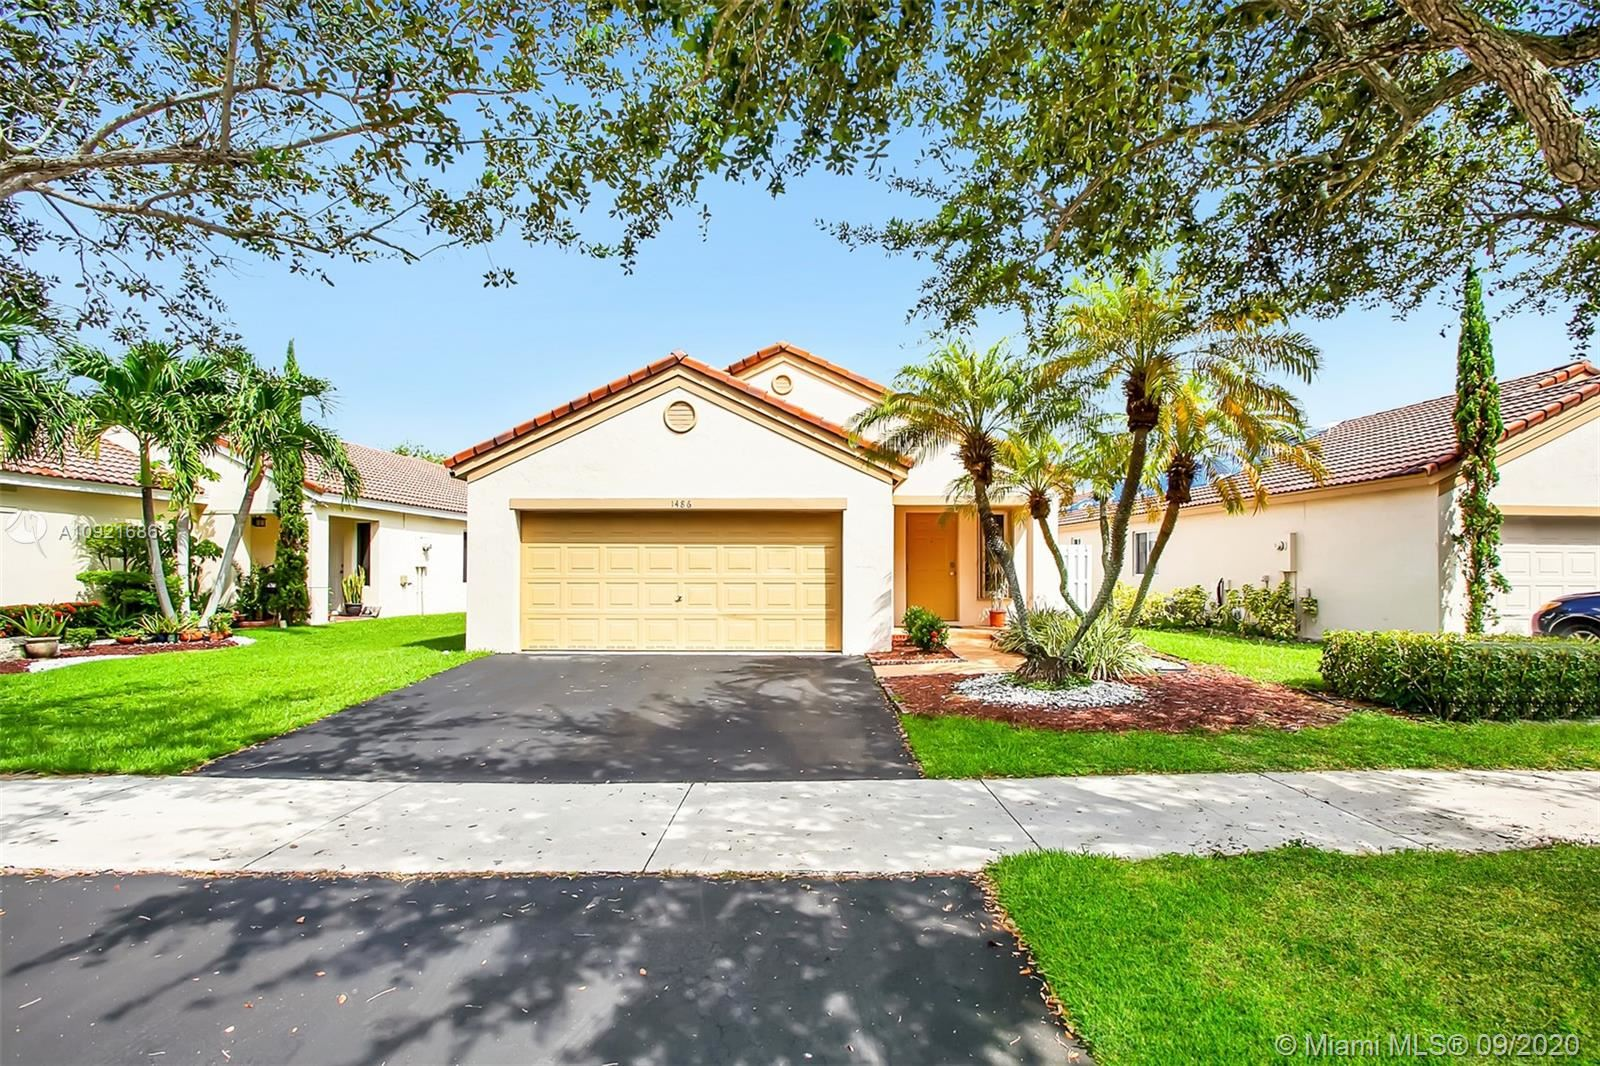 1486 Mira Vista Cir, Weston, FL 33327 - #: A10921686